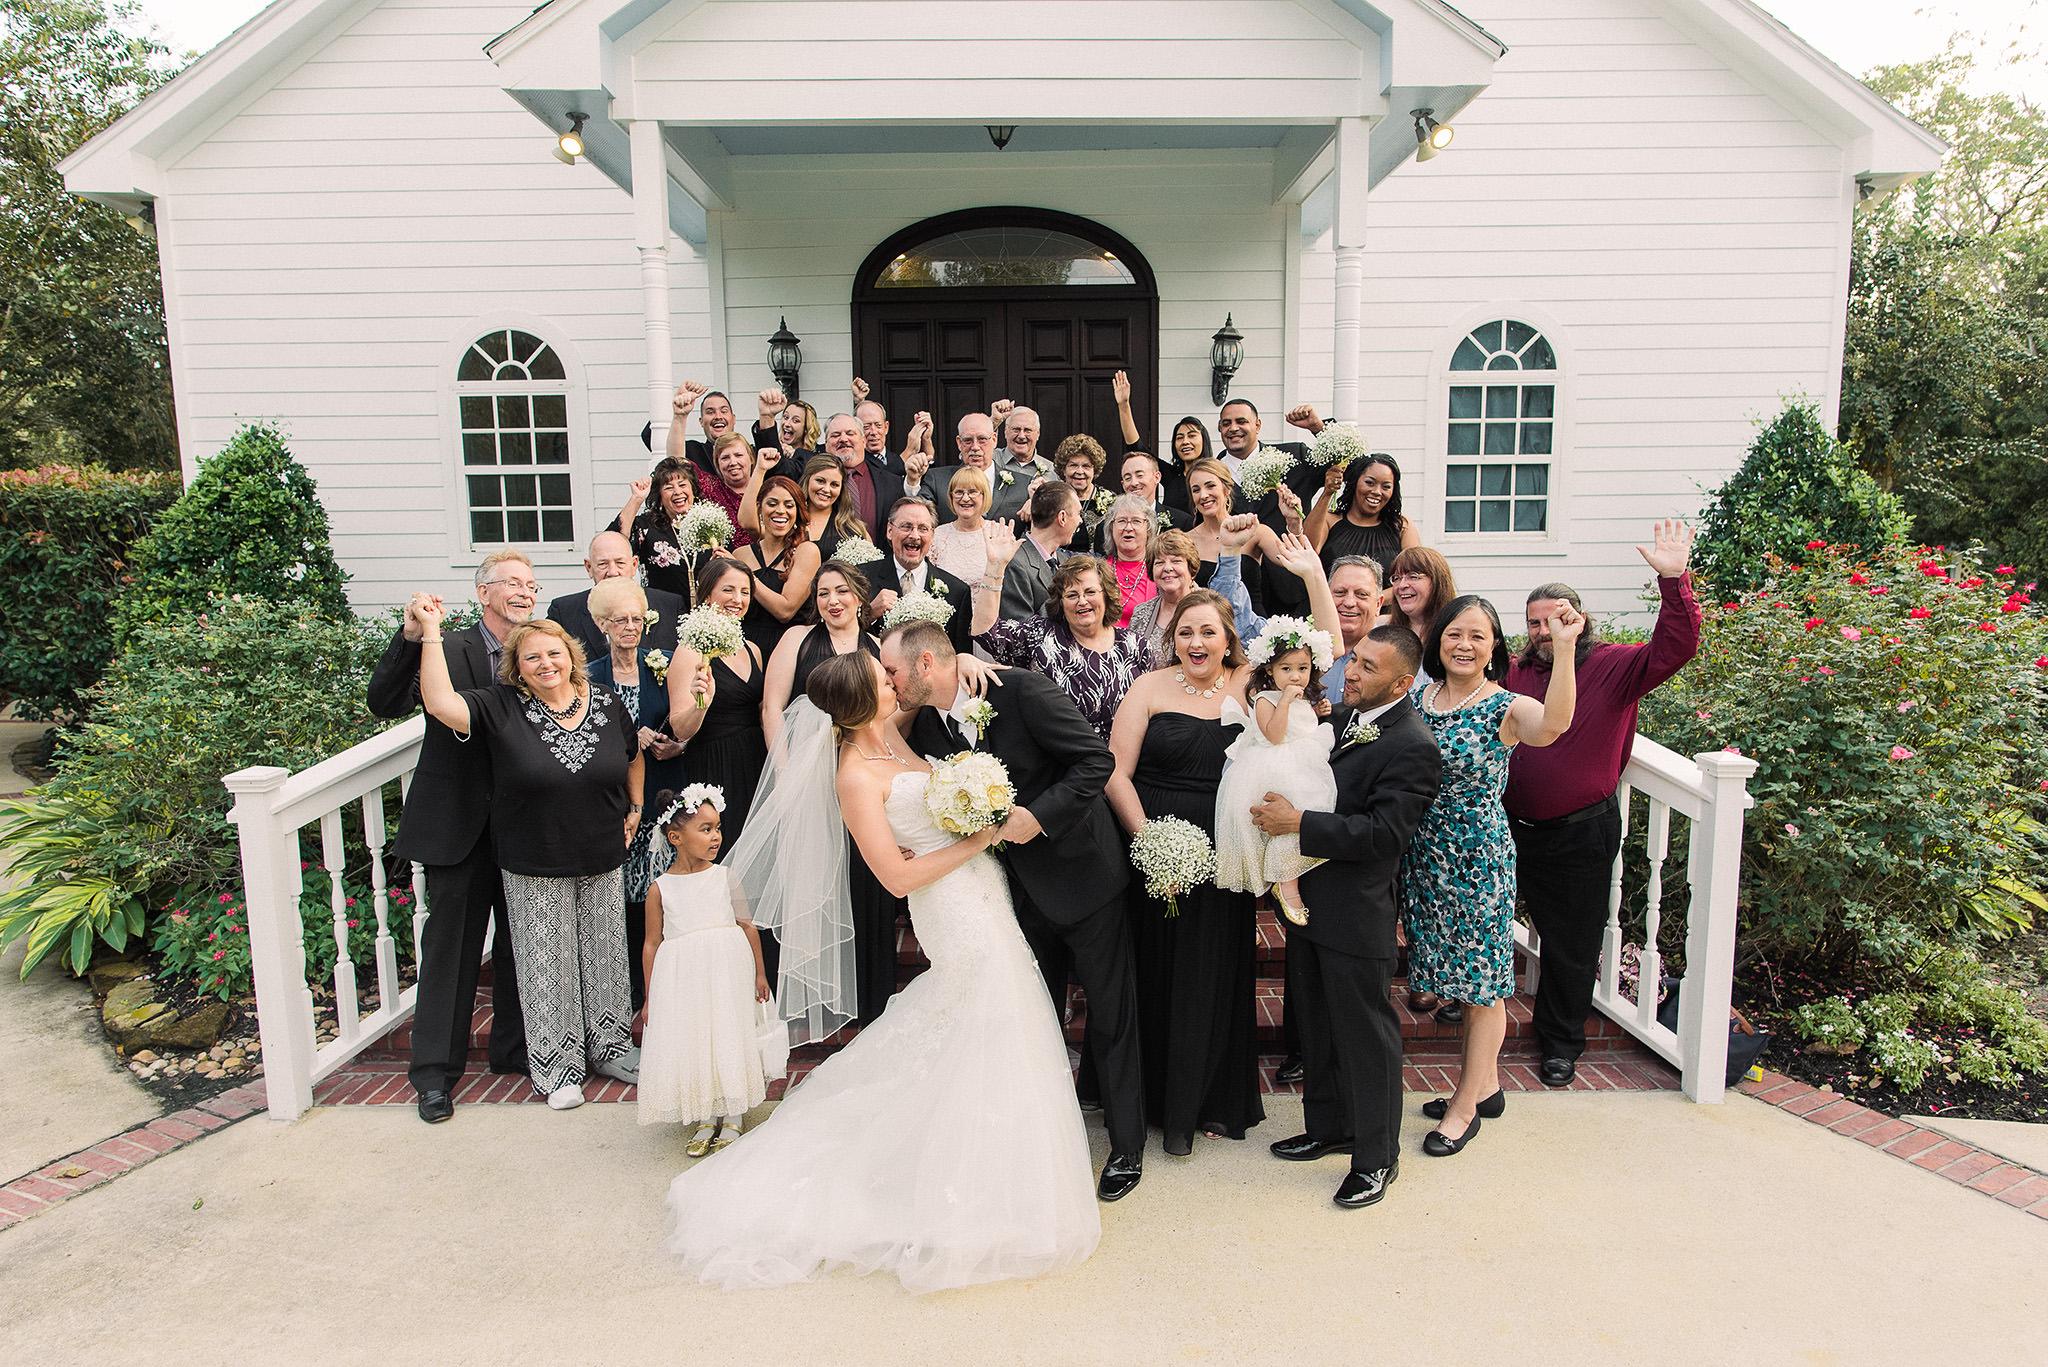 Ashelynn-manor-wedding-photographer-magnolia-texas-bridal